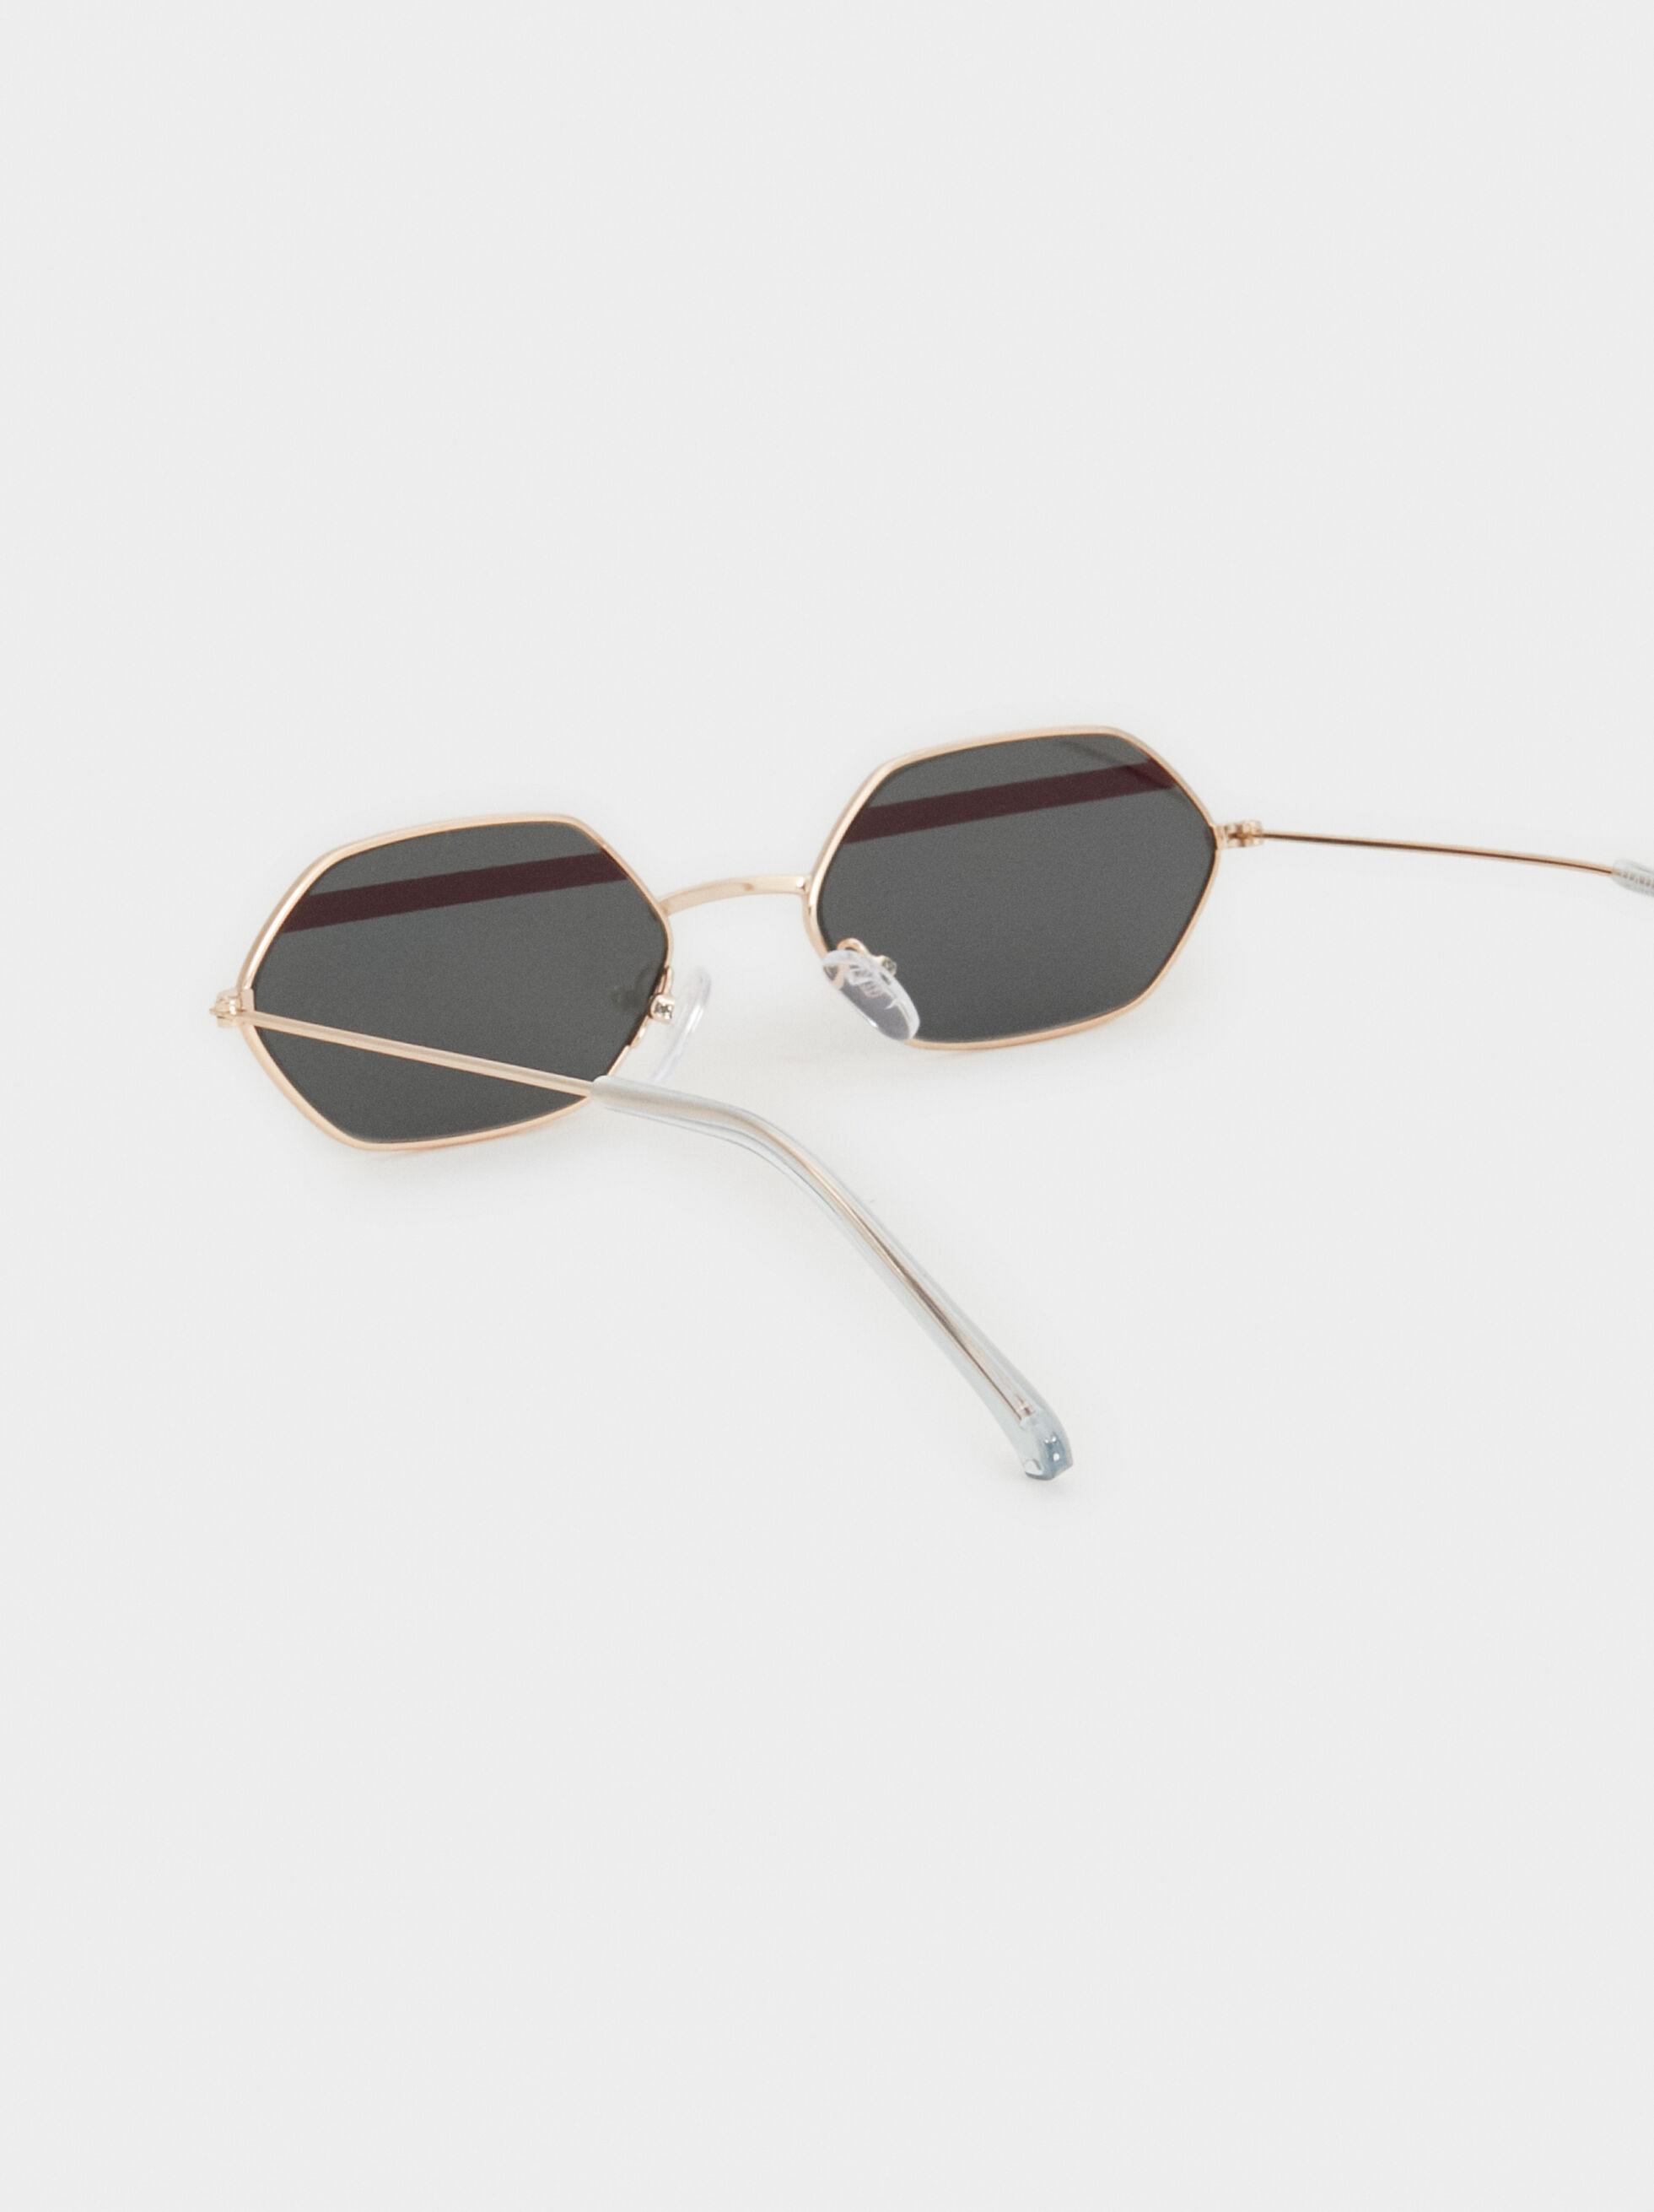 Tortoiseshell Geometric Sunglasses, Golden, hi-res